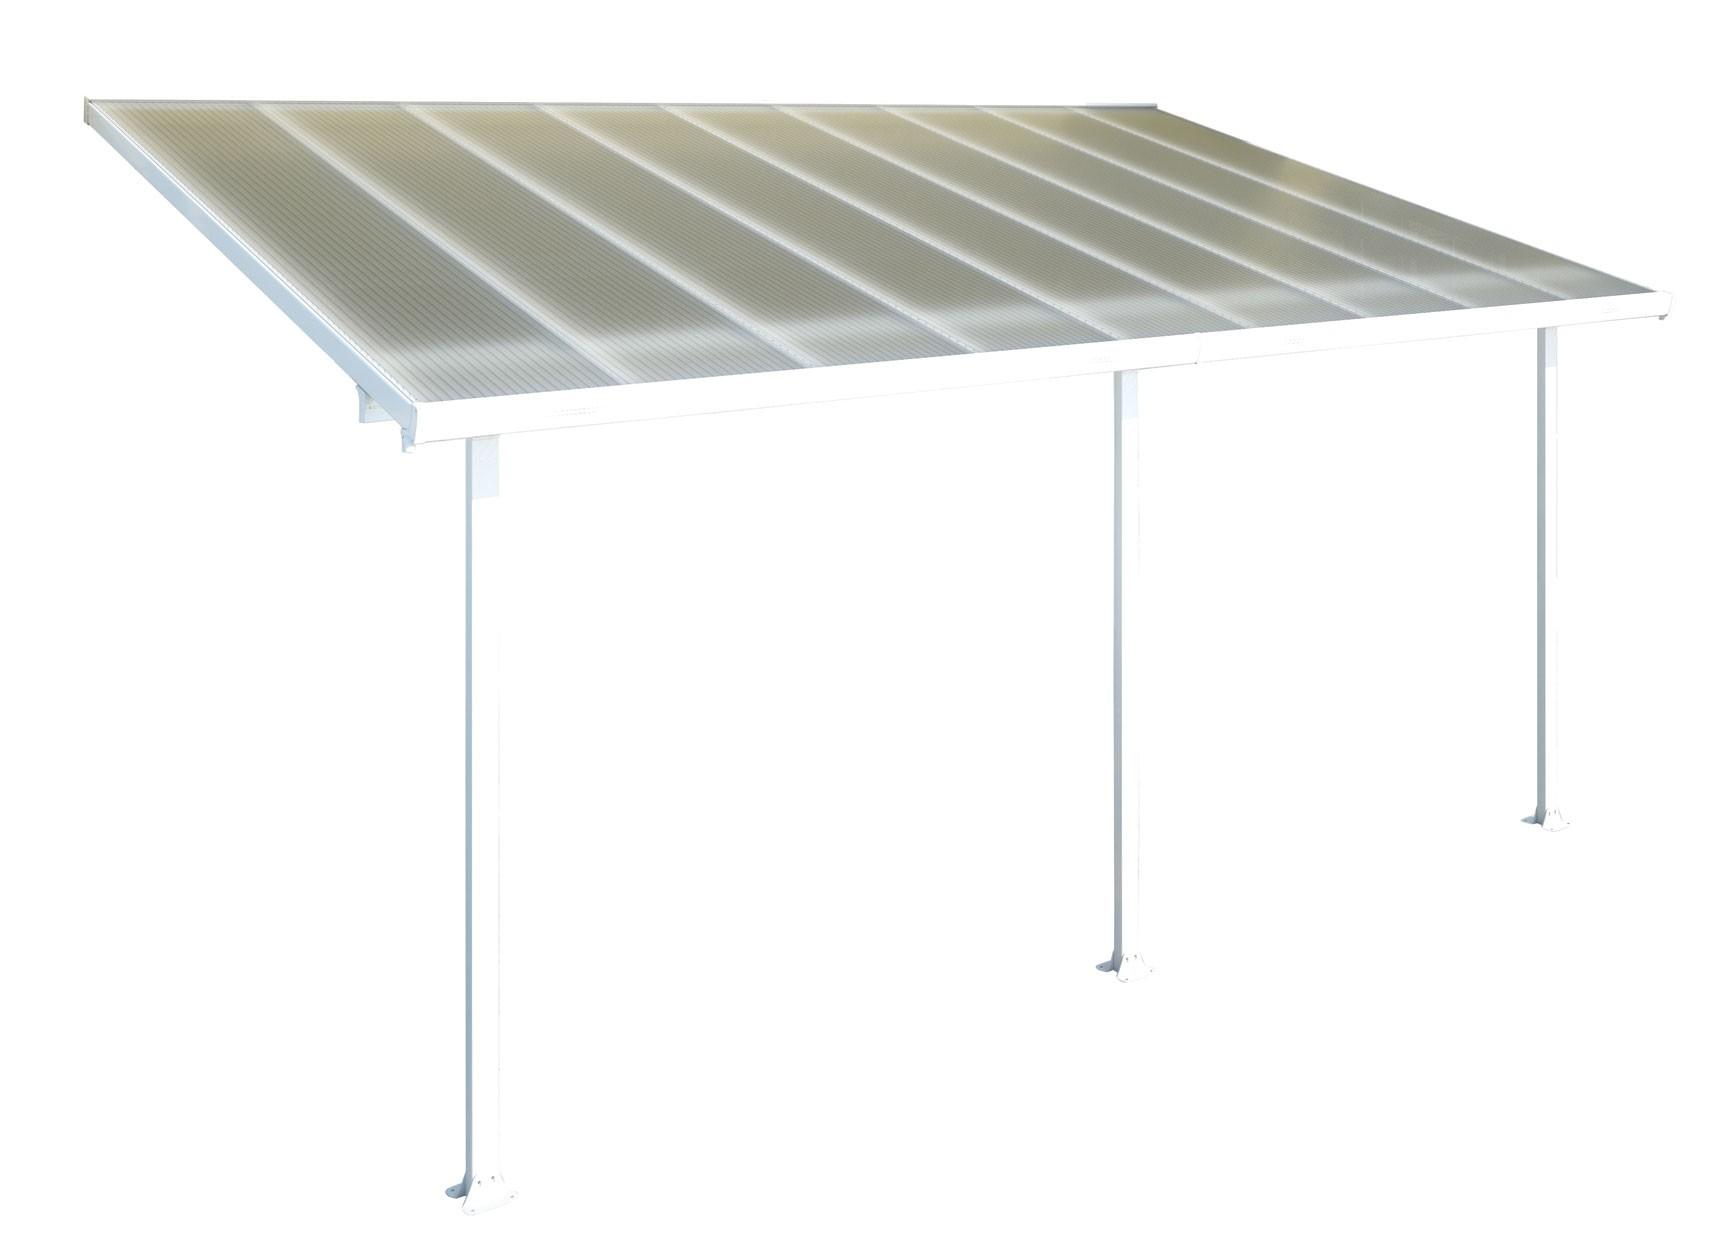 terrassen berdachung carport alu wei hohlkammerplatten 546x295cm bei. Black Bedroom Furniture Sets. Home Design Ideas